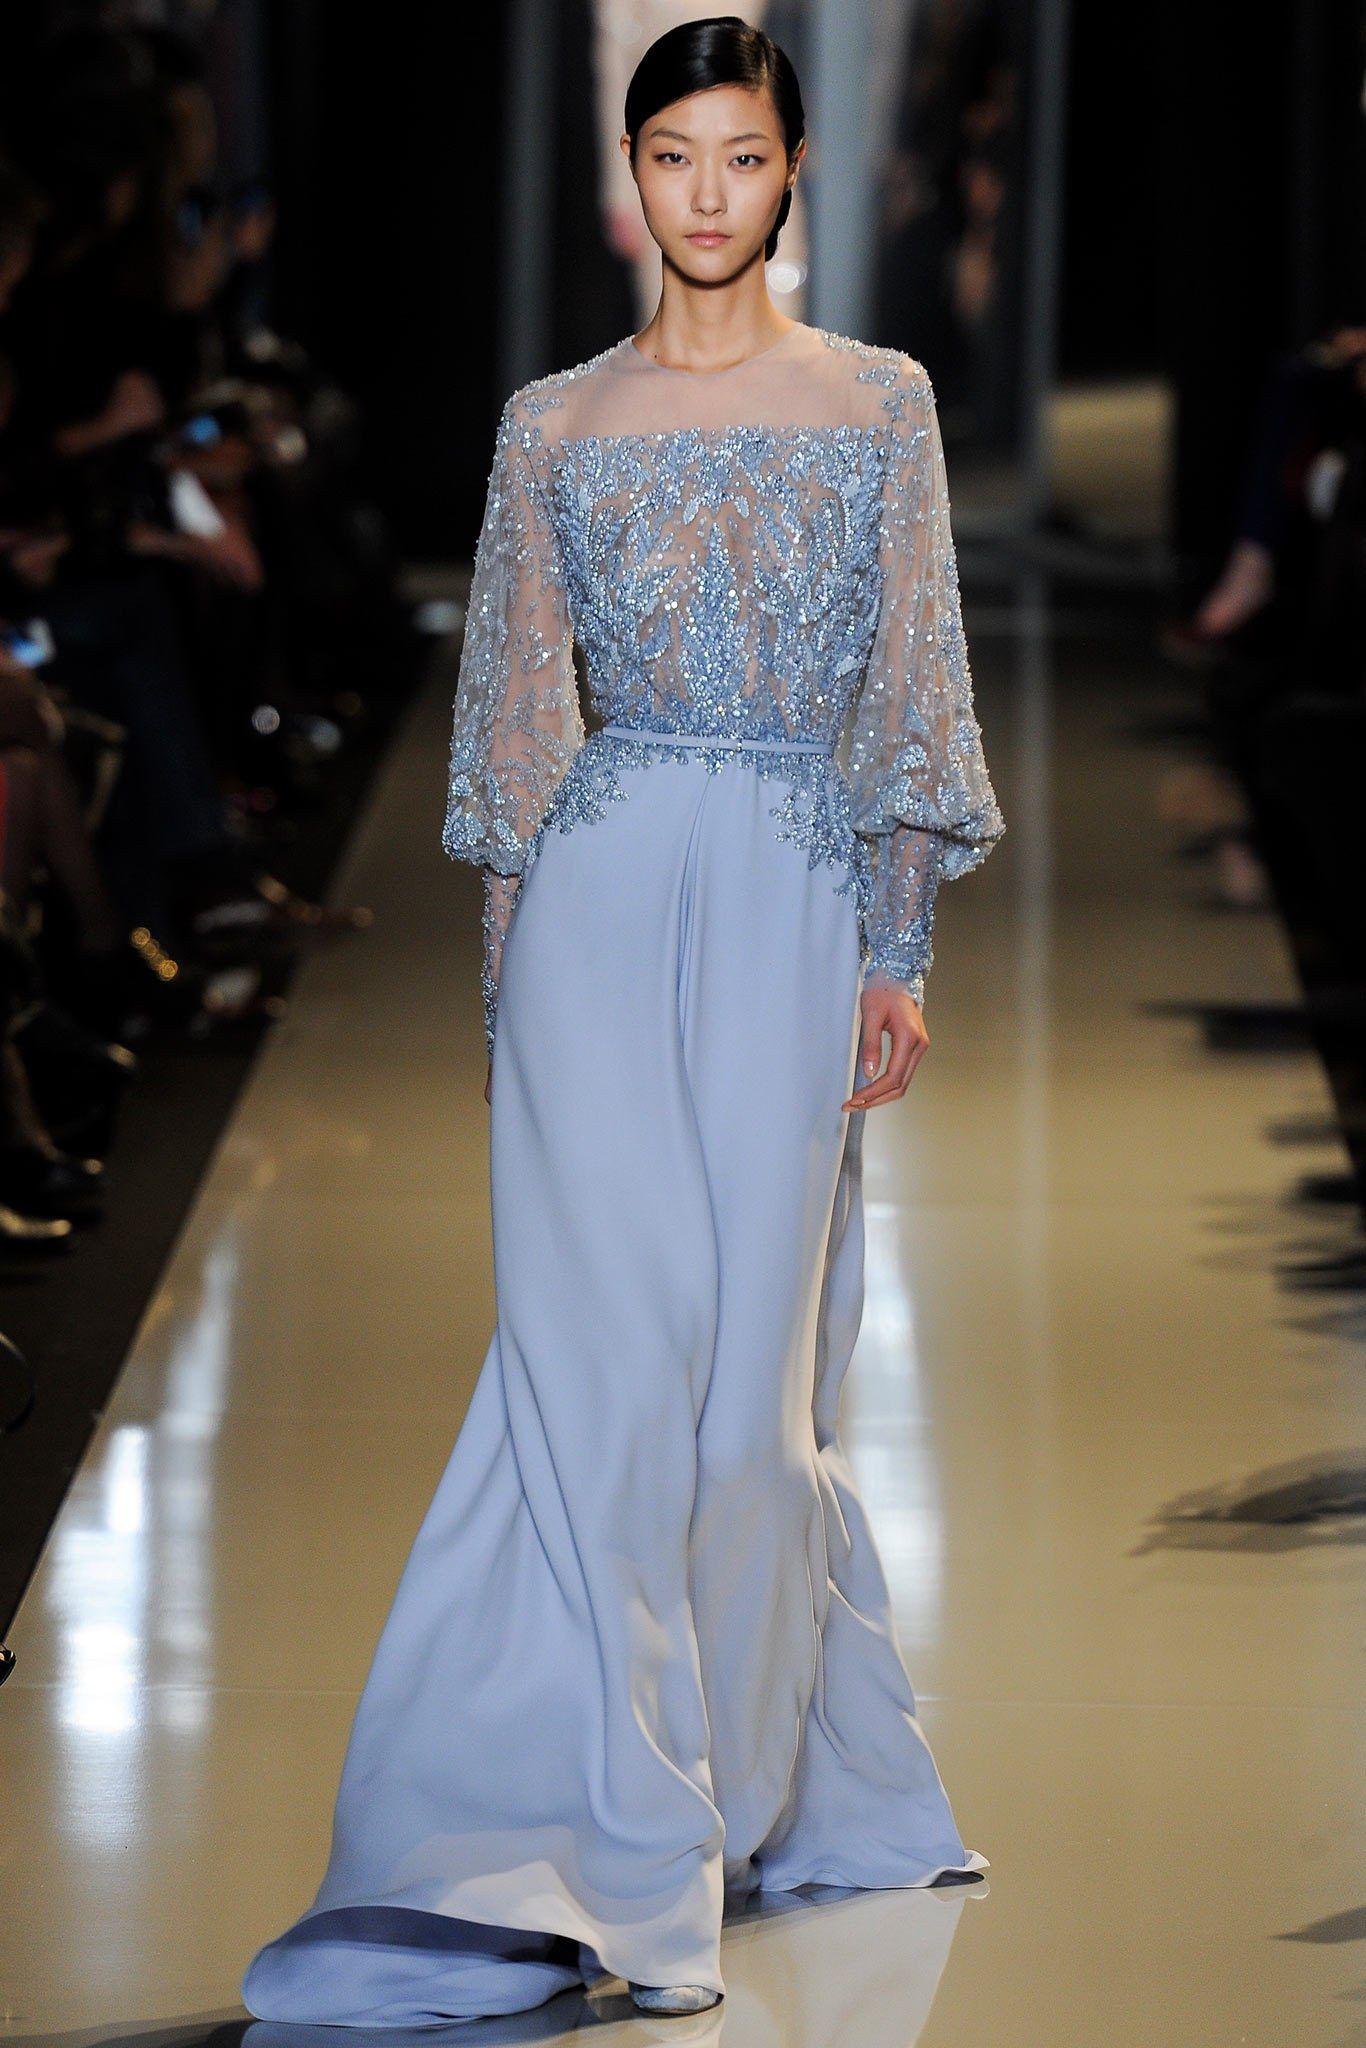 Elie Saab Spring 2013 Couture Fashion Show - Ji Hye Park (Elite)